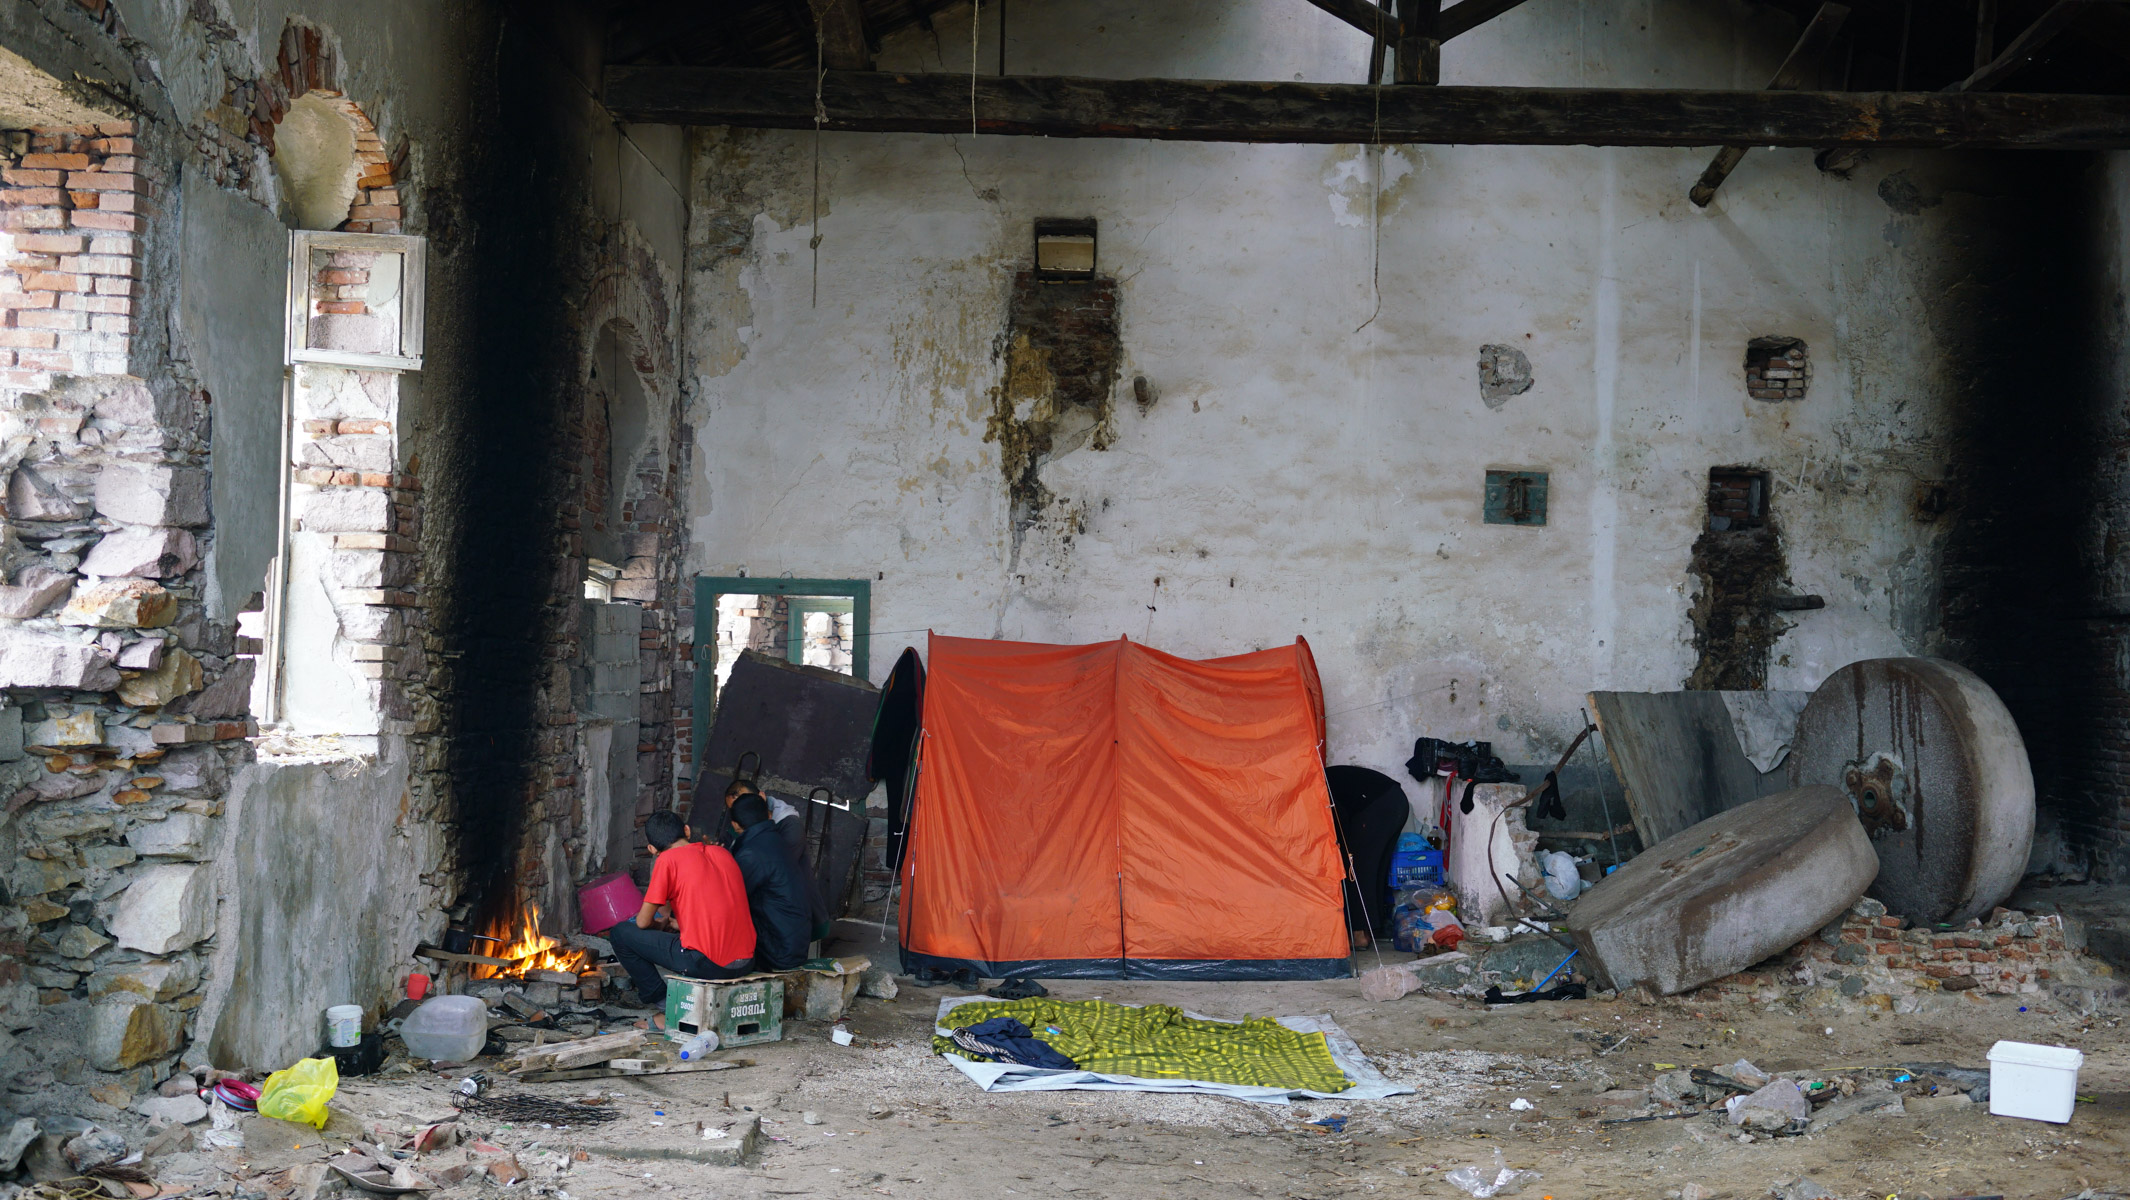 Syrian men make camp in an abandoned building. Panagiouda, Lesvos, Greece. November 2016. Photo: Talitha Brauer